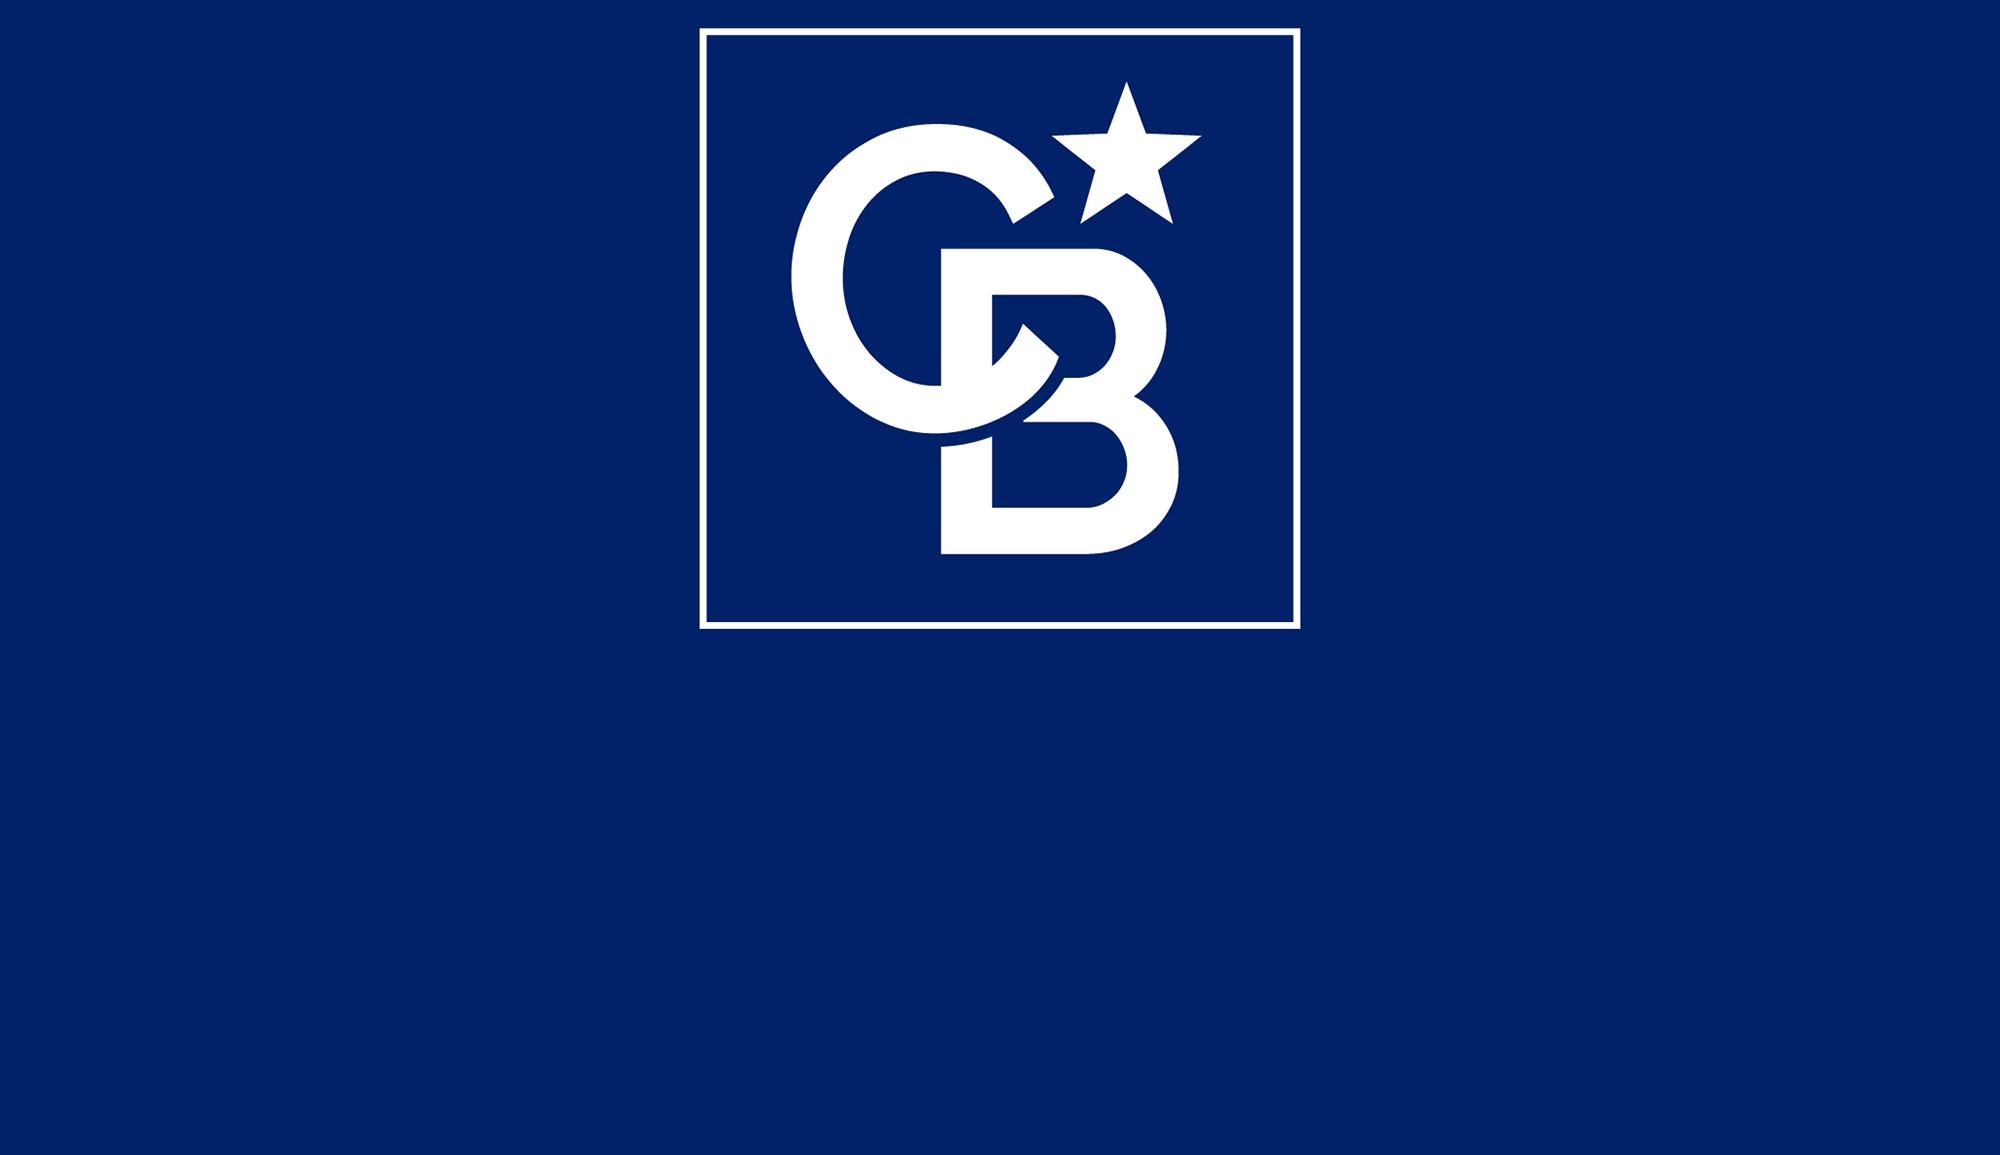 Edward Remenapp - Coldwell Banker Weir Manuel Logo